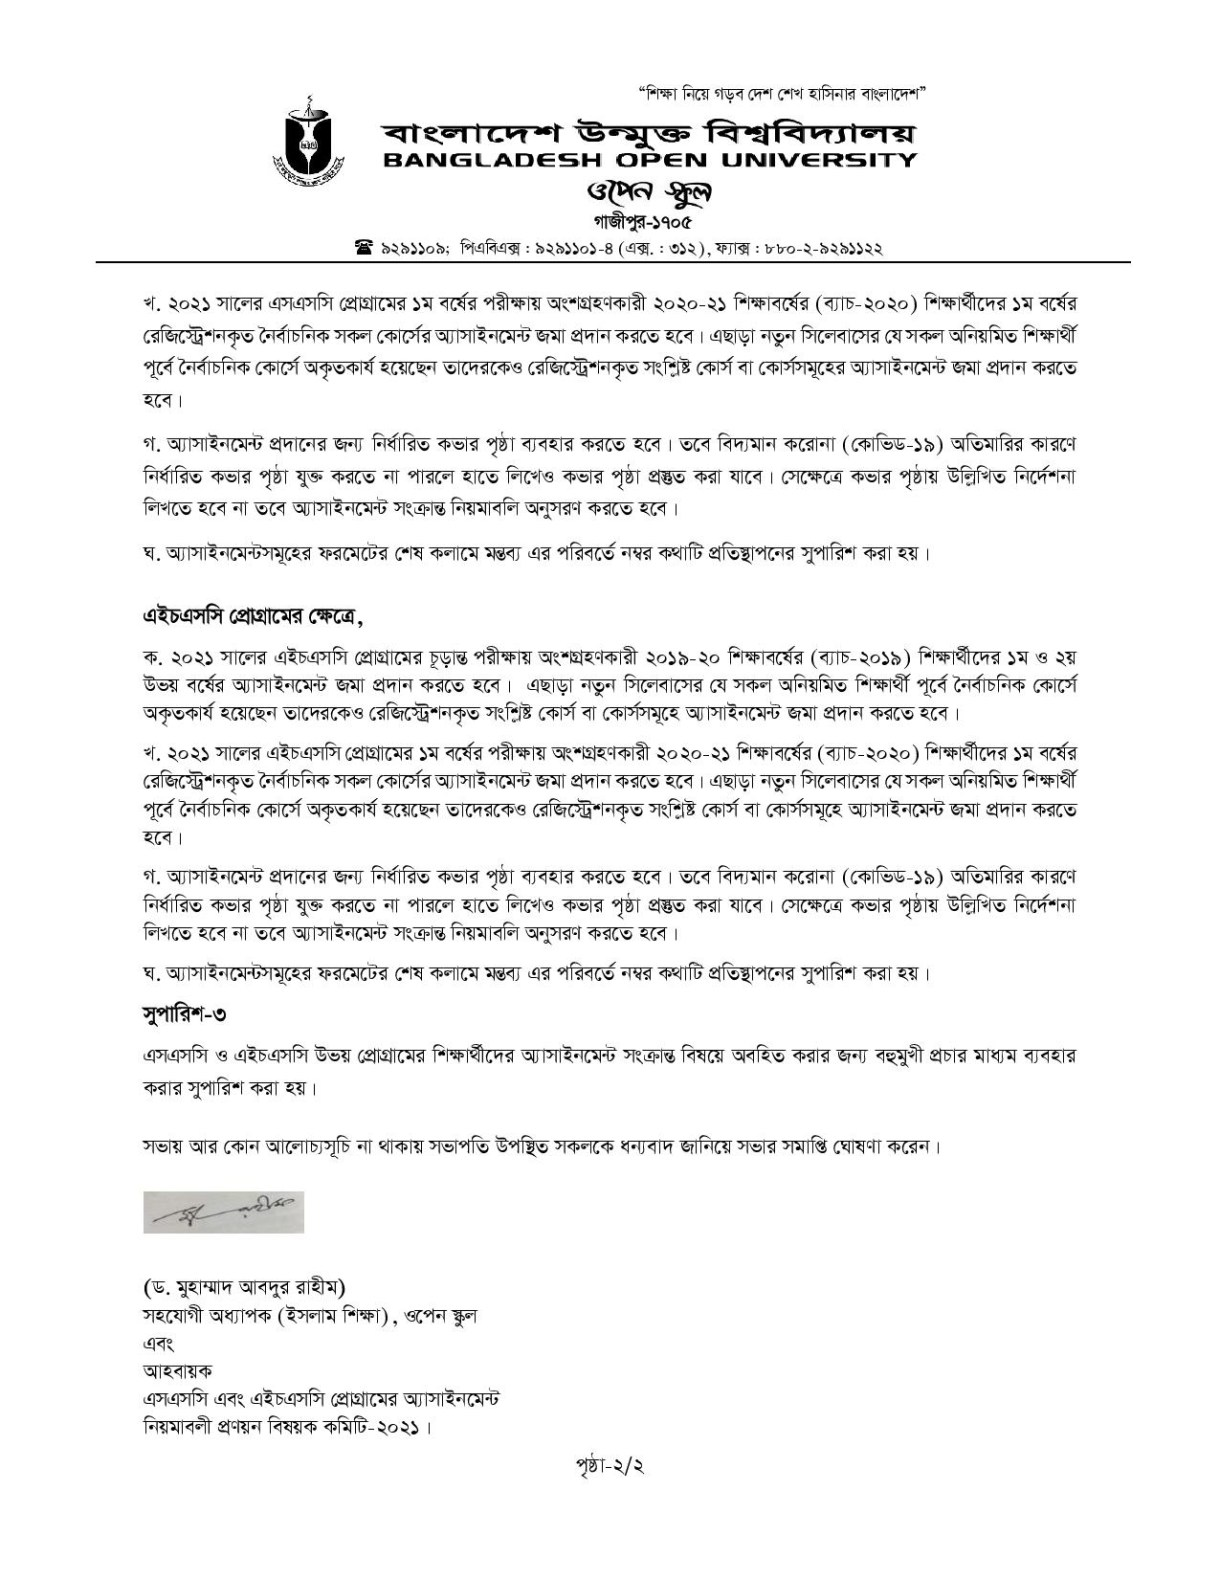 Bangladesh Open University BOU HSC Assignment Answer 2021 Pdf Download 30